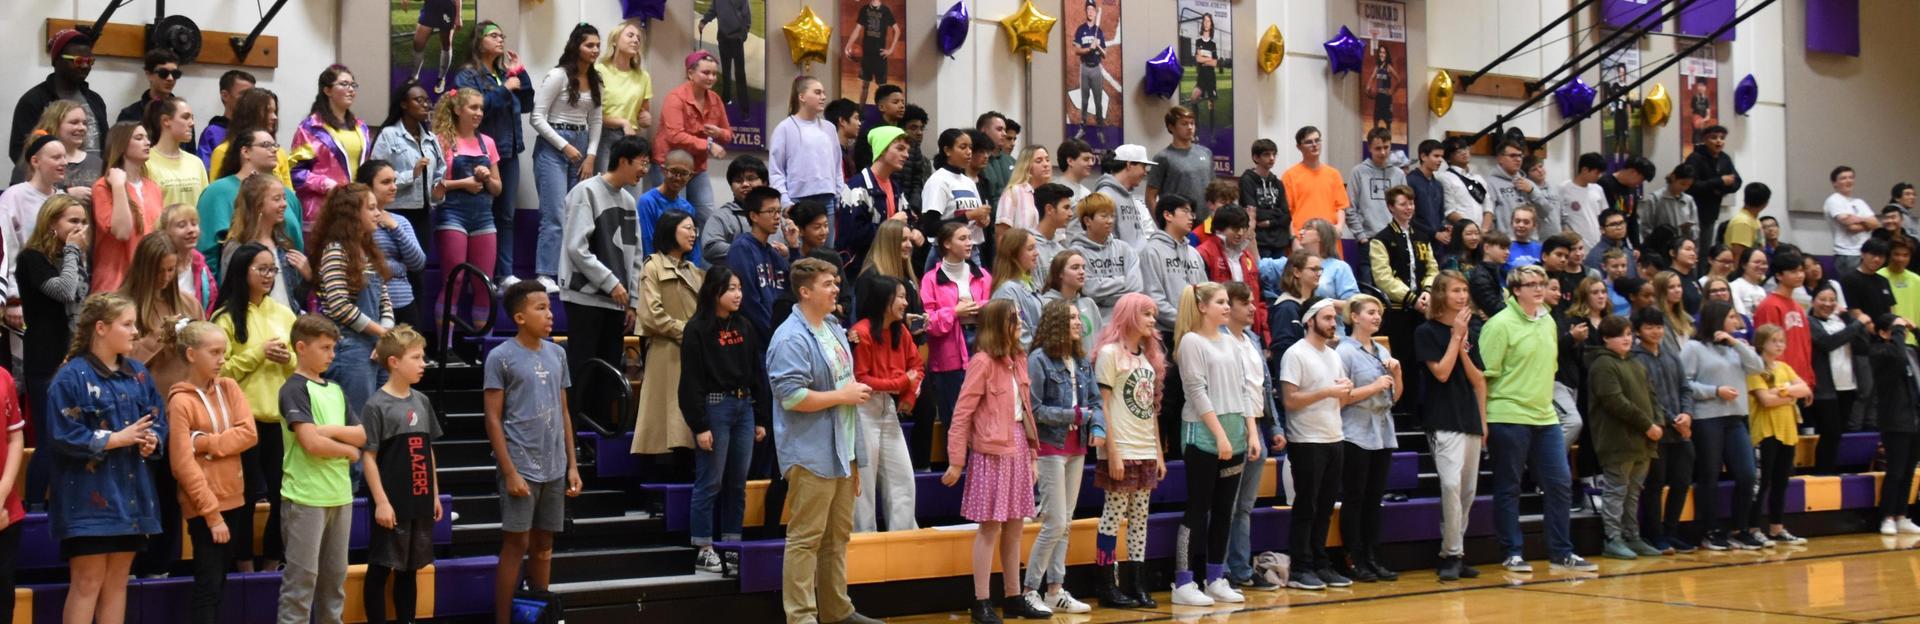 Students at Portland Christian Schools